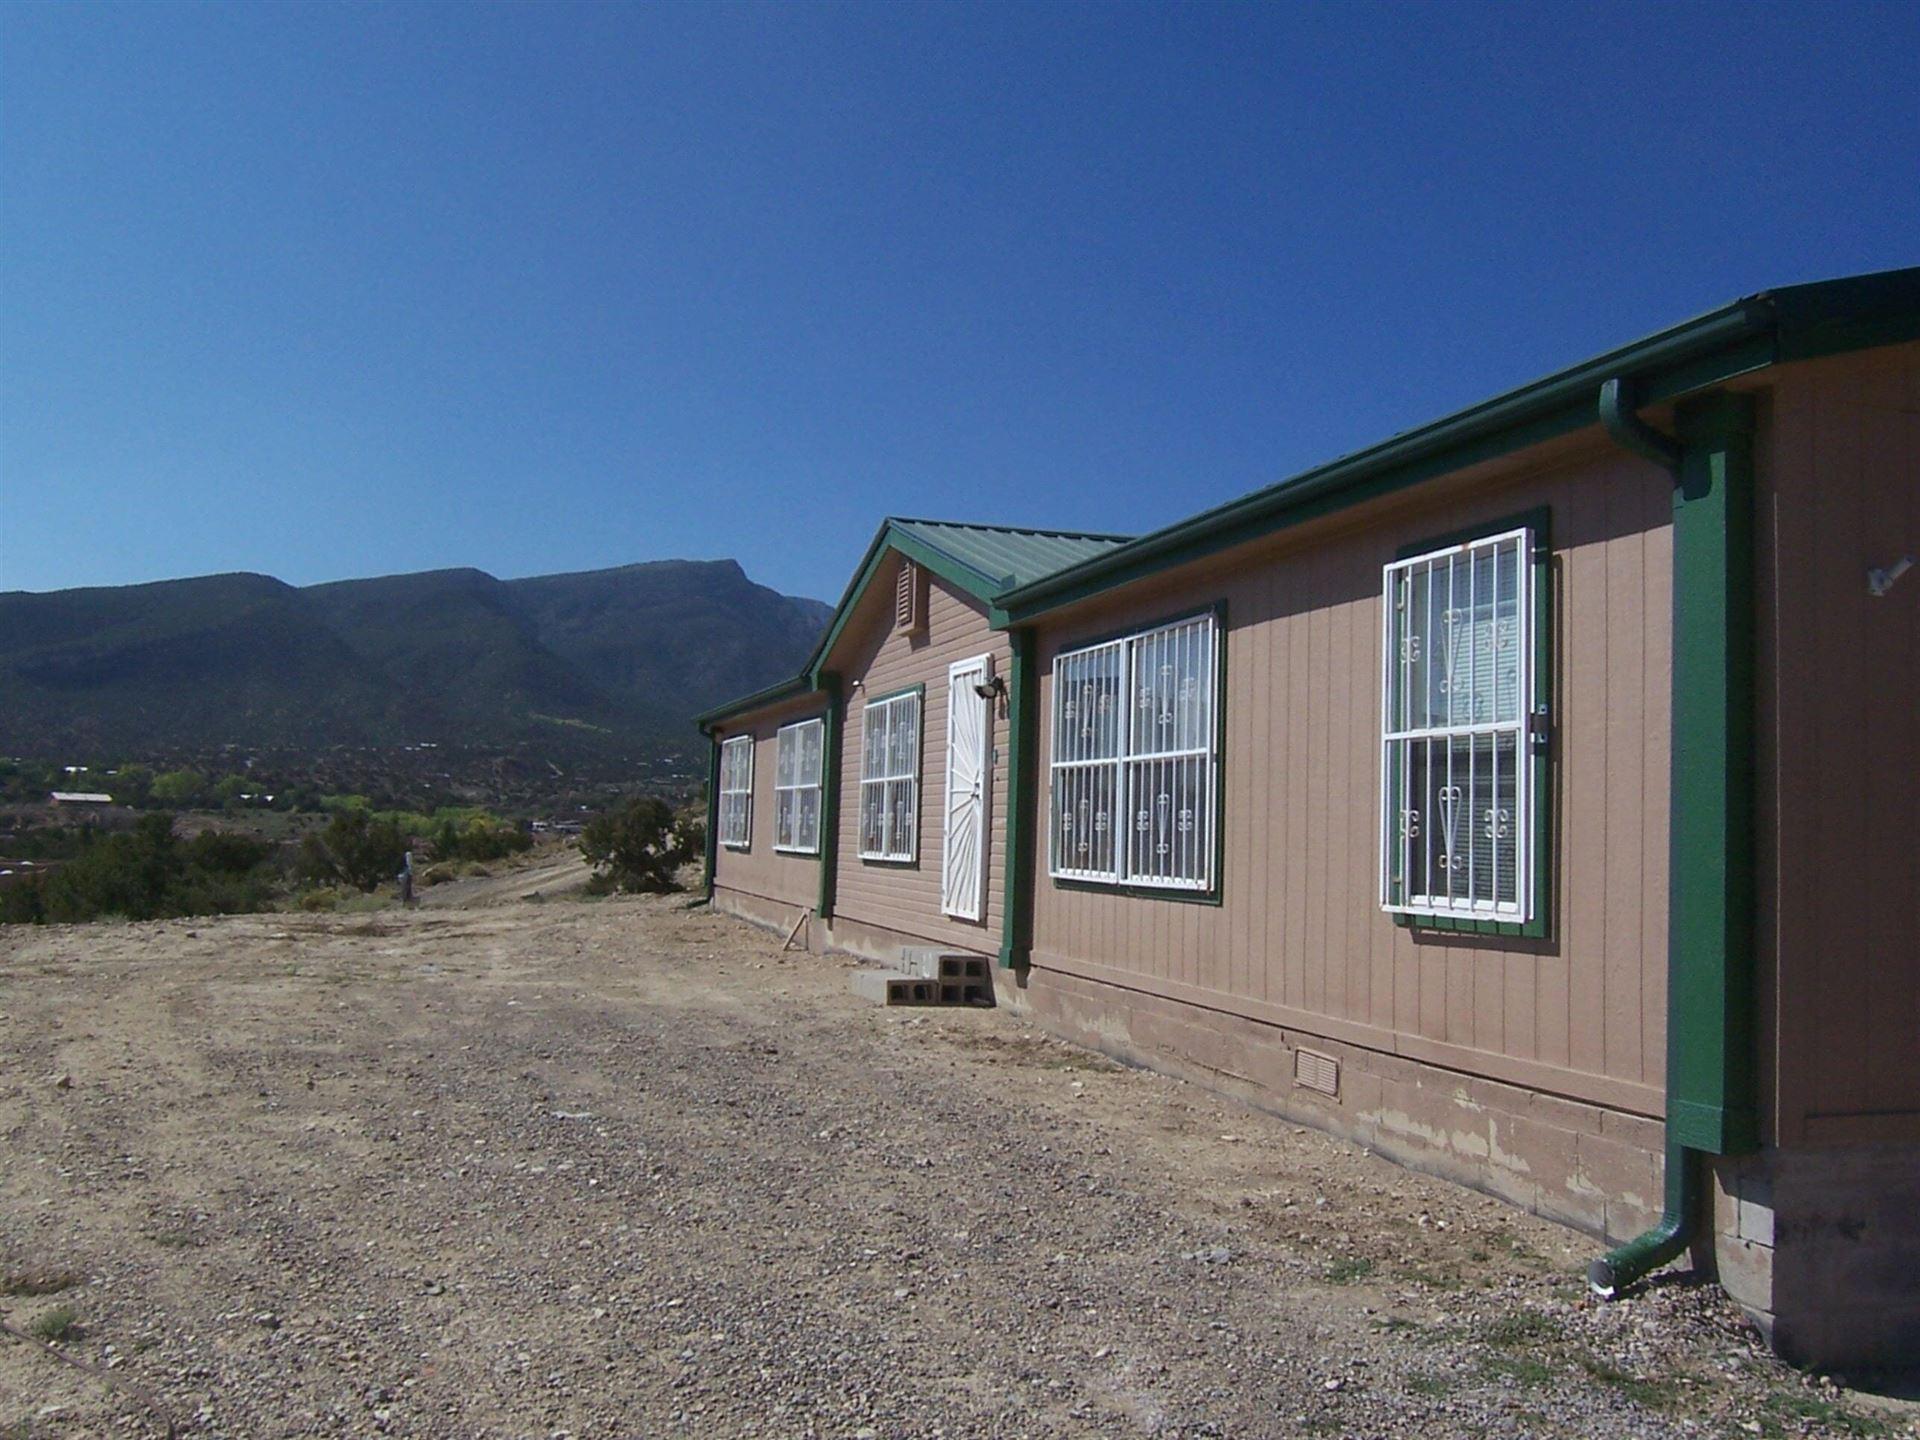 5 CAMINO DE SAN FELIPE, Placitas, NM 87043 - #: 1001285